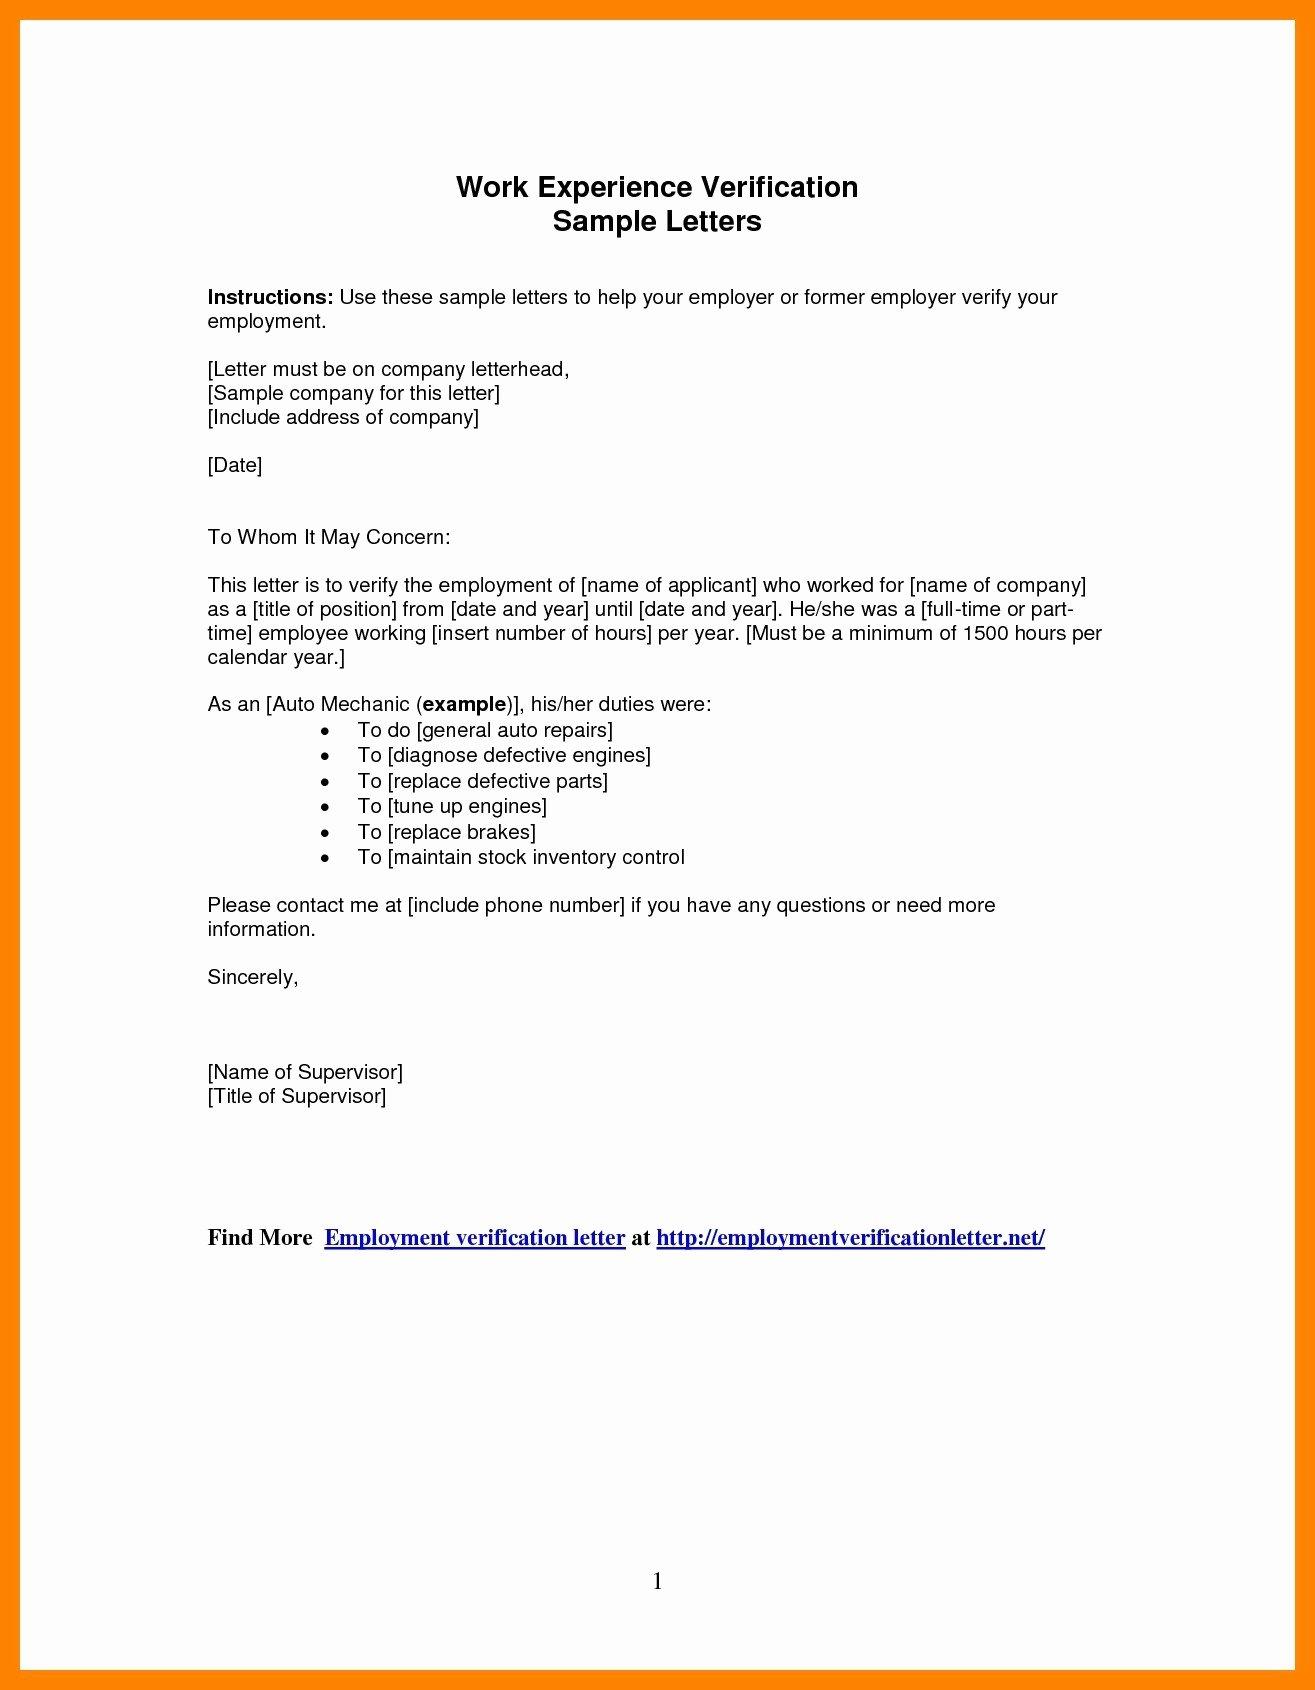 Employment Verification Letter form Beautiful Employment Verification Letter to whom It May Concern